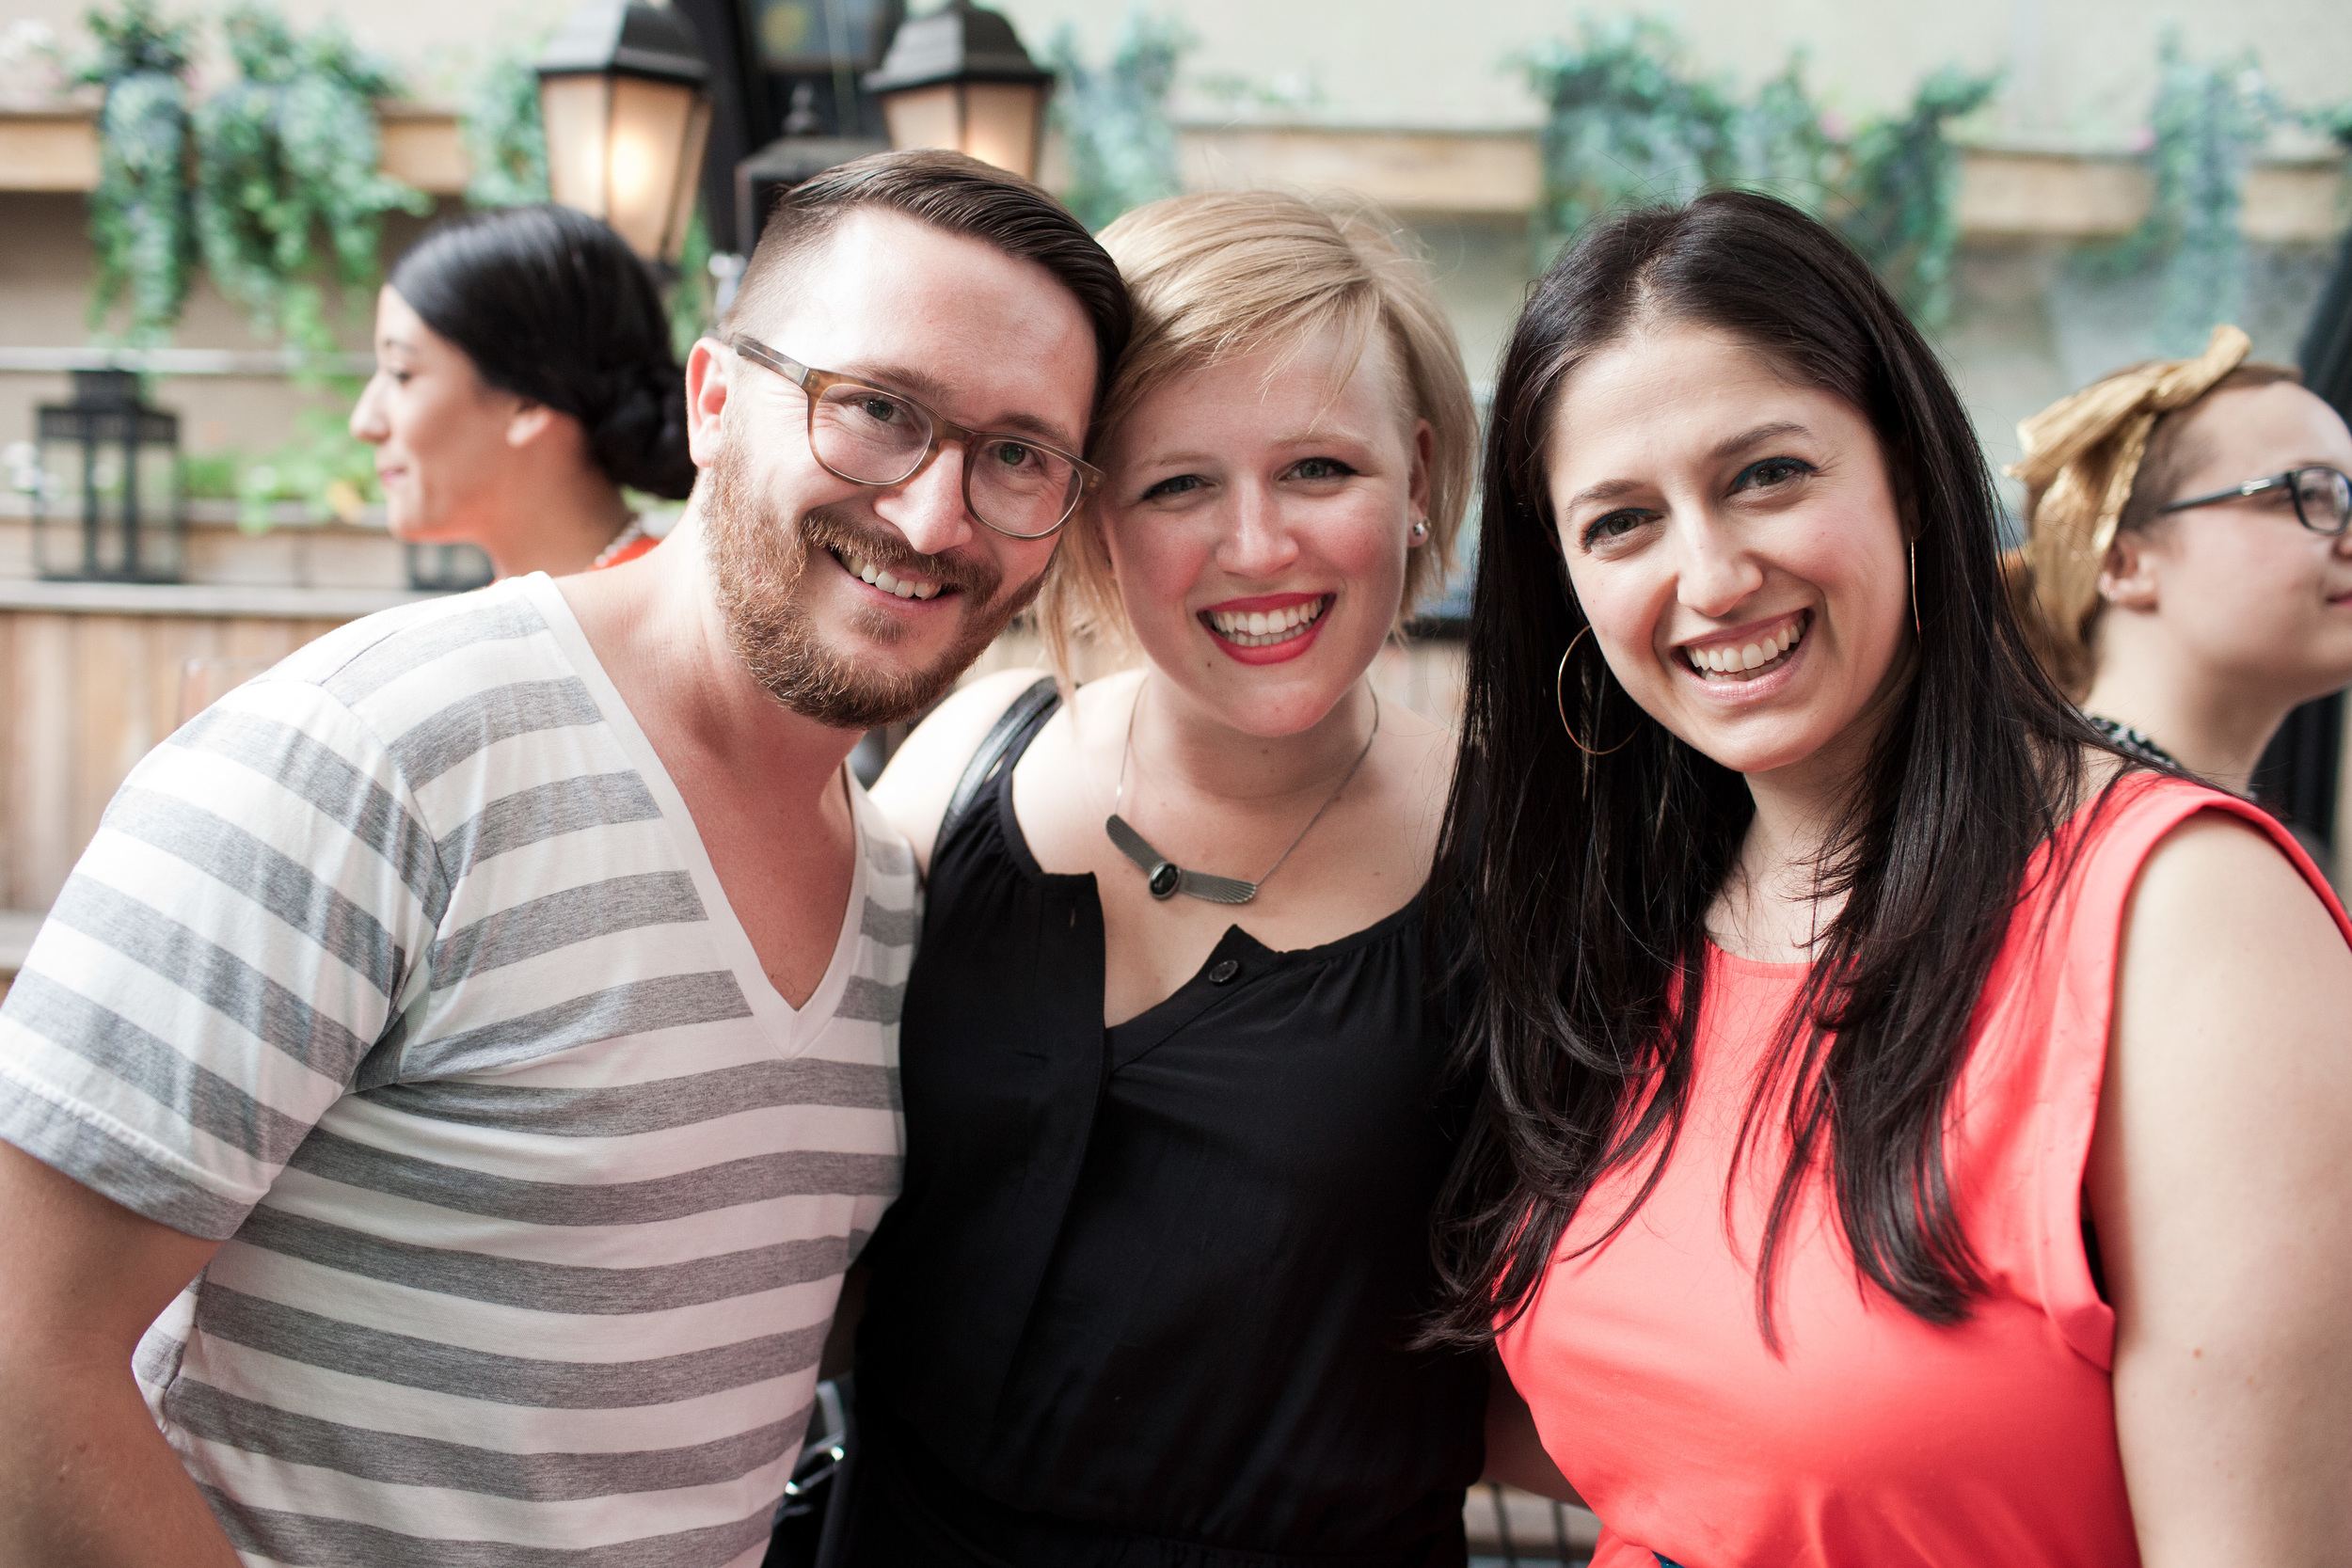 Jove Meyer , Melanie and Sharon looking radiant!